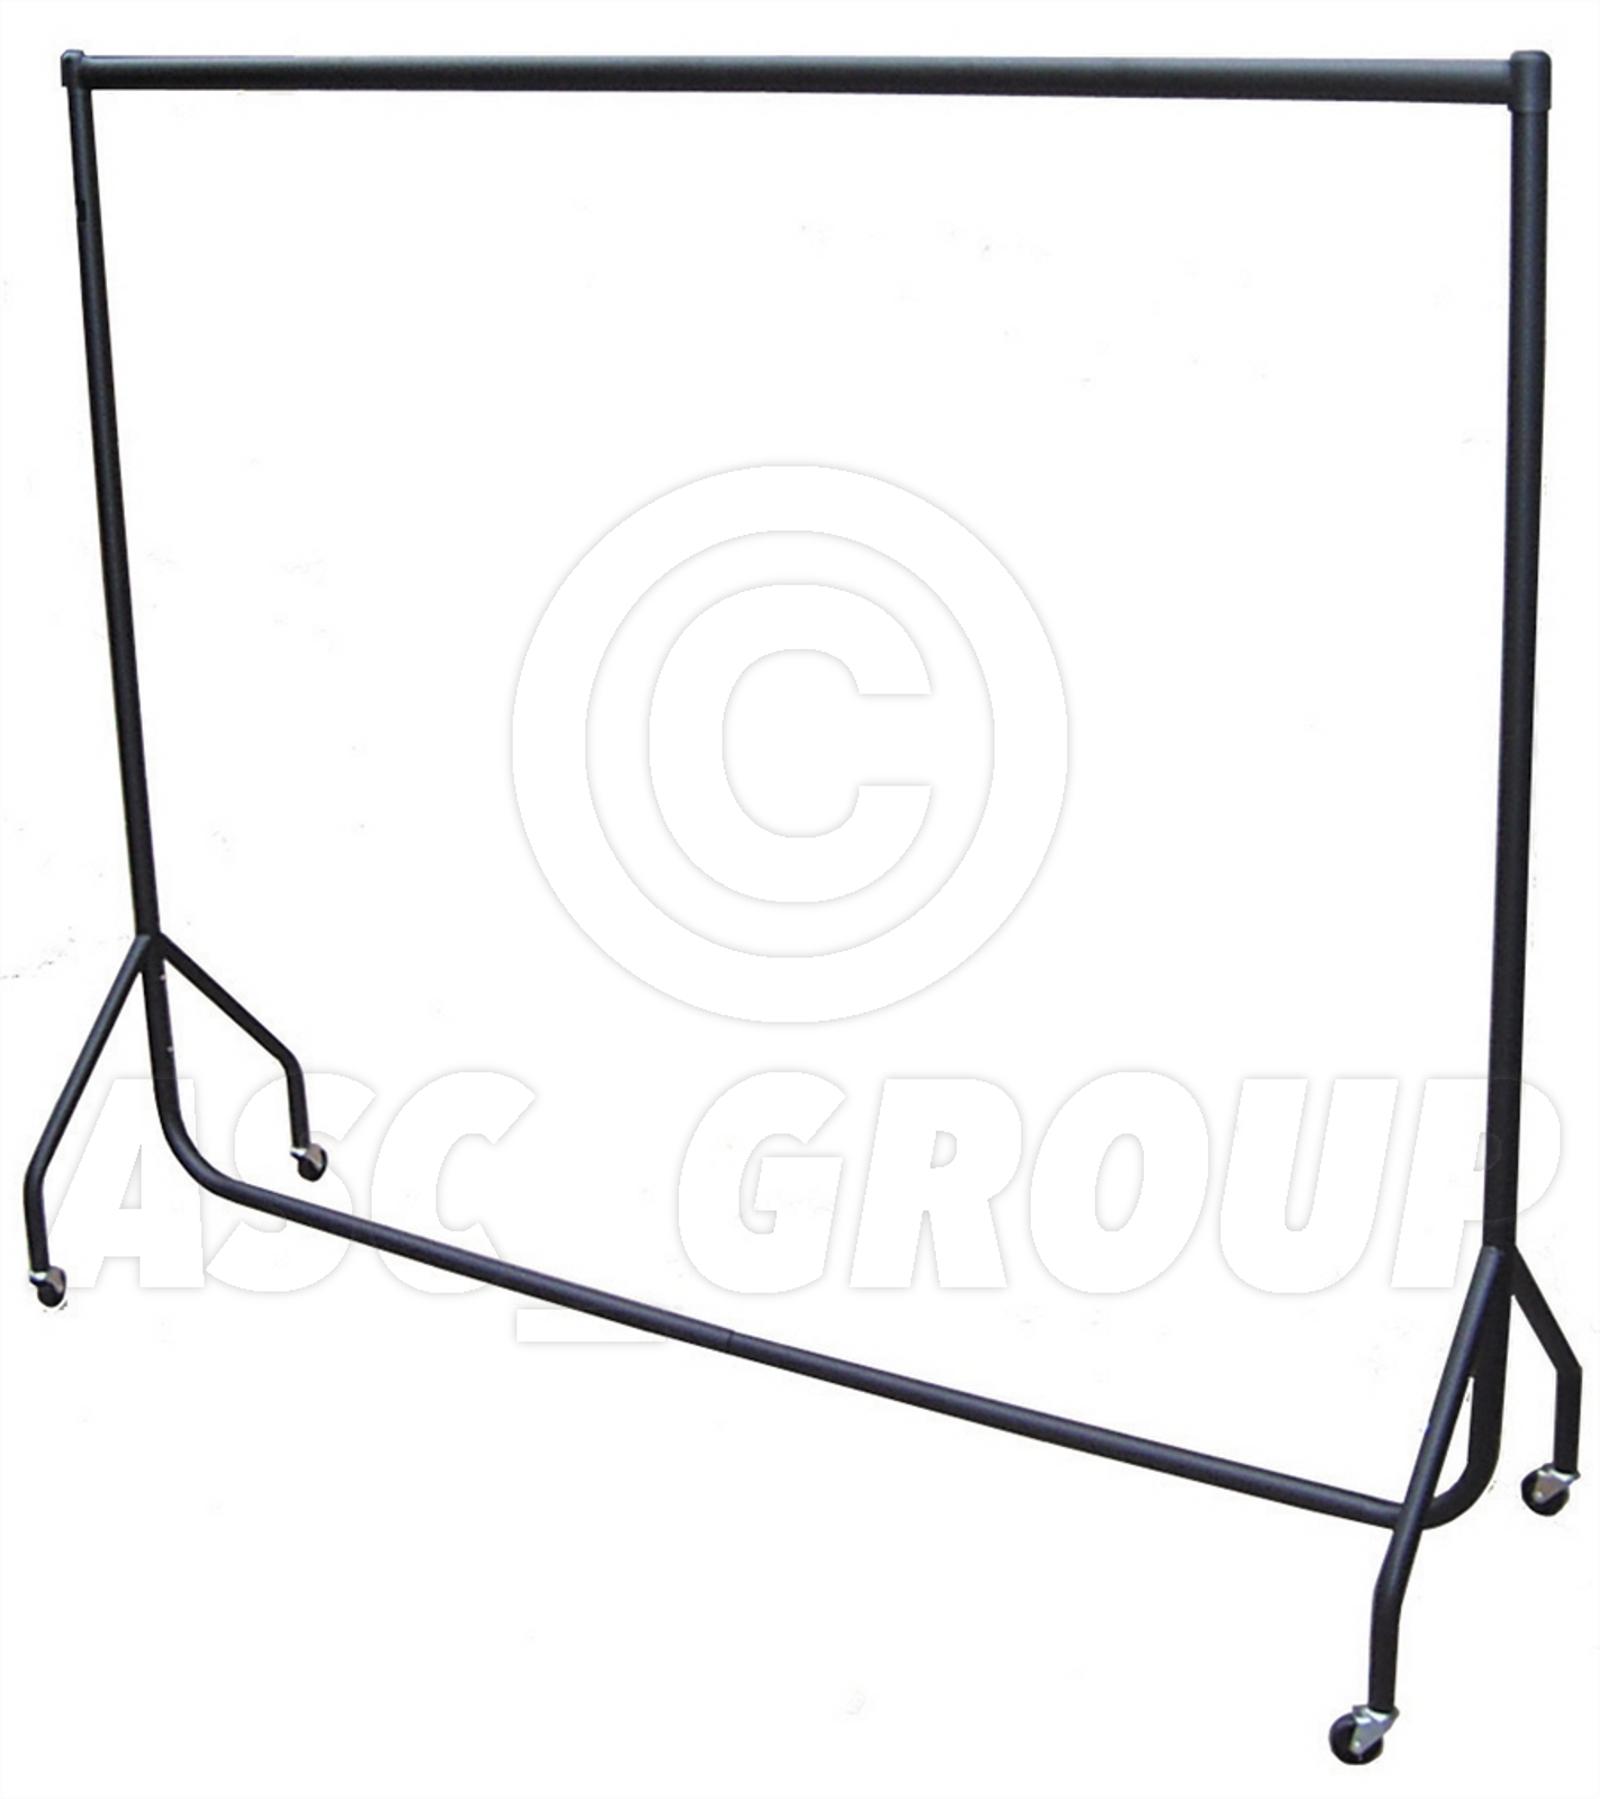 heavy duty metal clothes rail - 6ft long  183cm